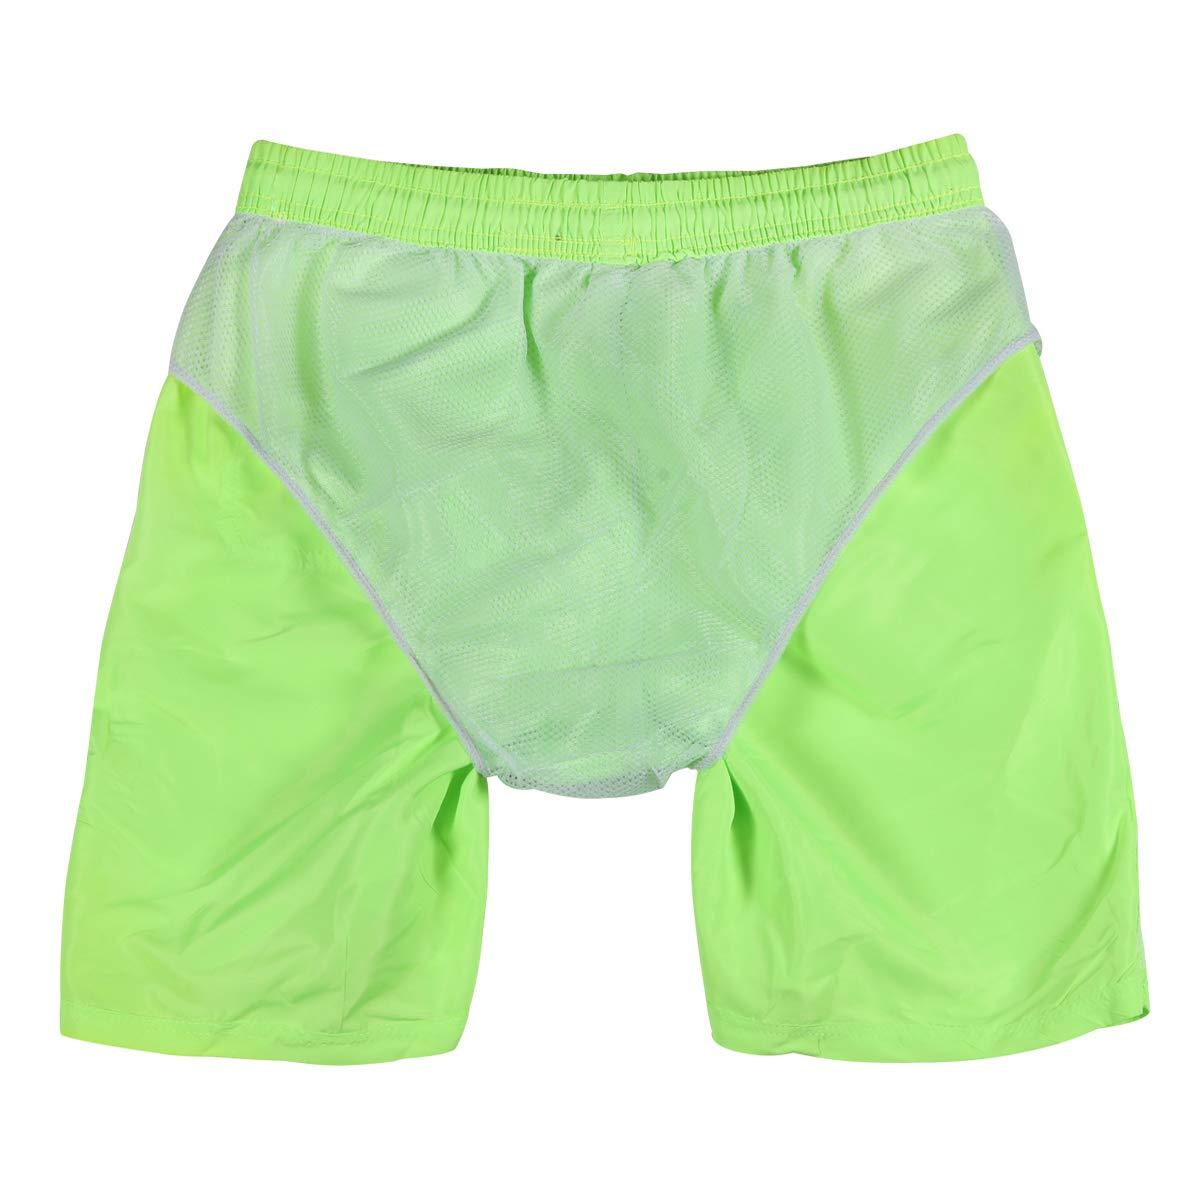 LEIDAI Men\'s Outdoor Water Sports Surfing Boardshorts Swim Trunks (Fluorescent Green, XXL)